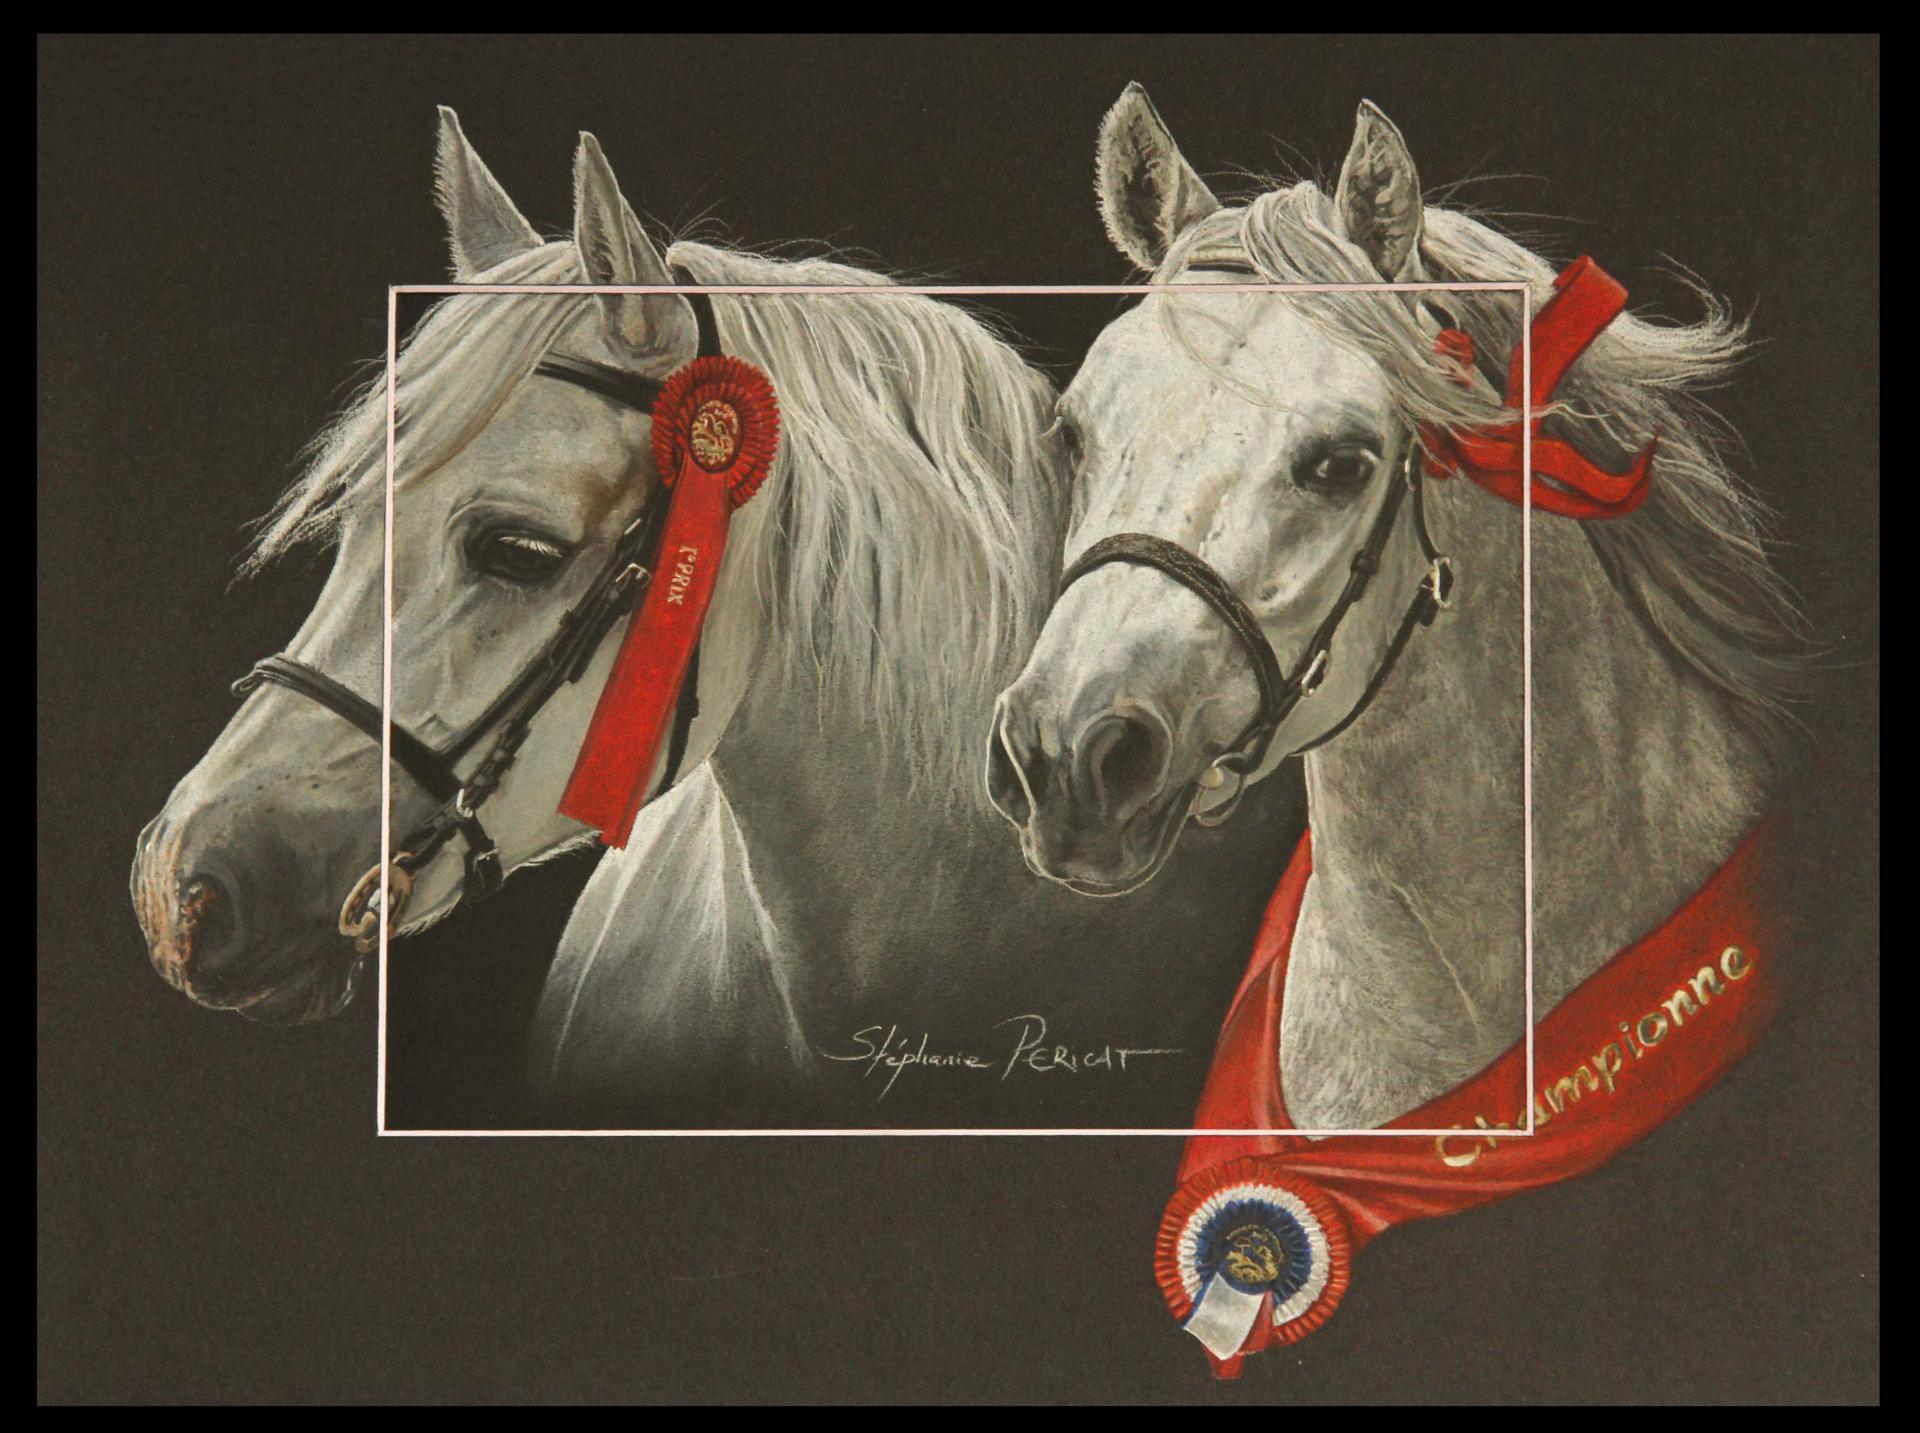 COURT & EMBER, mère et fille connemaras (connemara mother and filly) - pastel sec (soft pastel) - 30x40cm